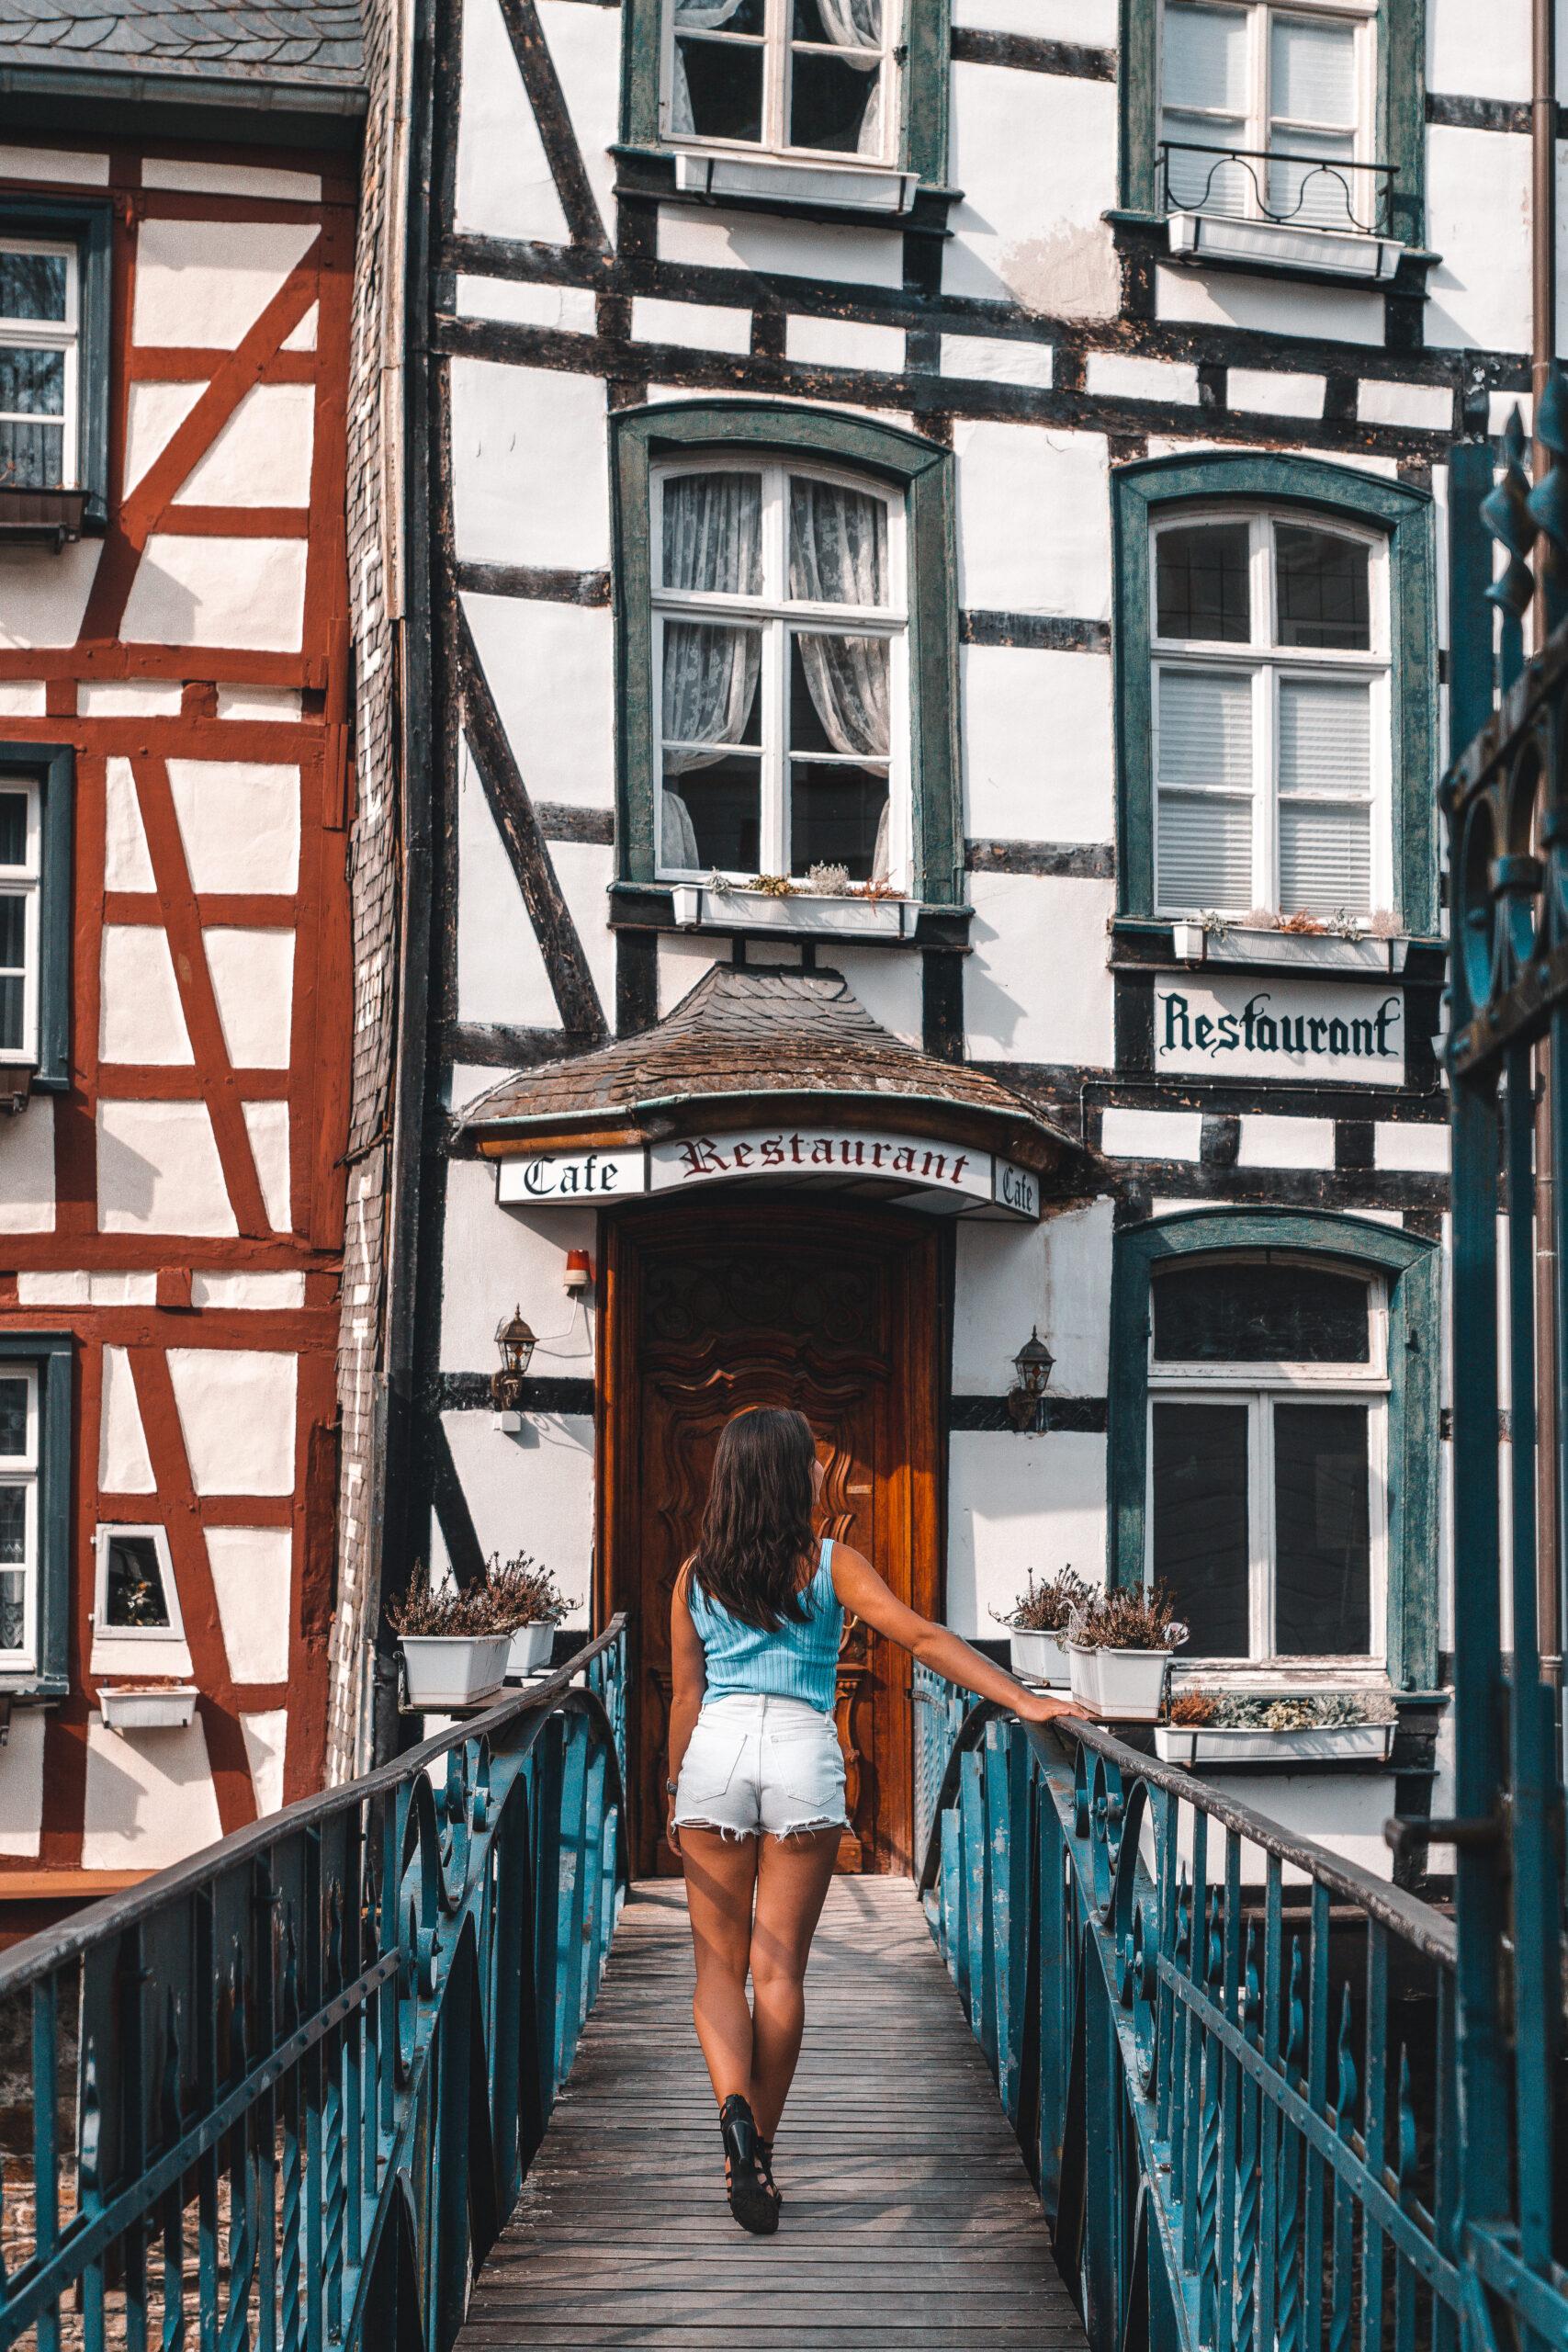 Monschau Travel Guide